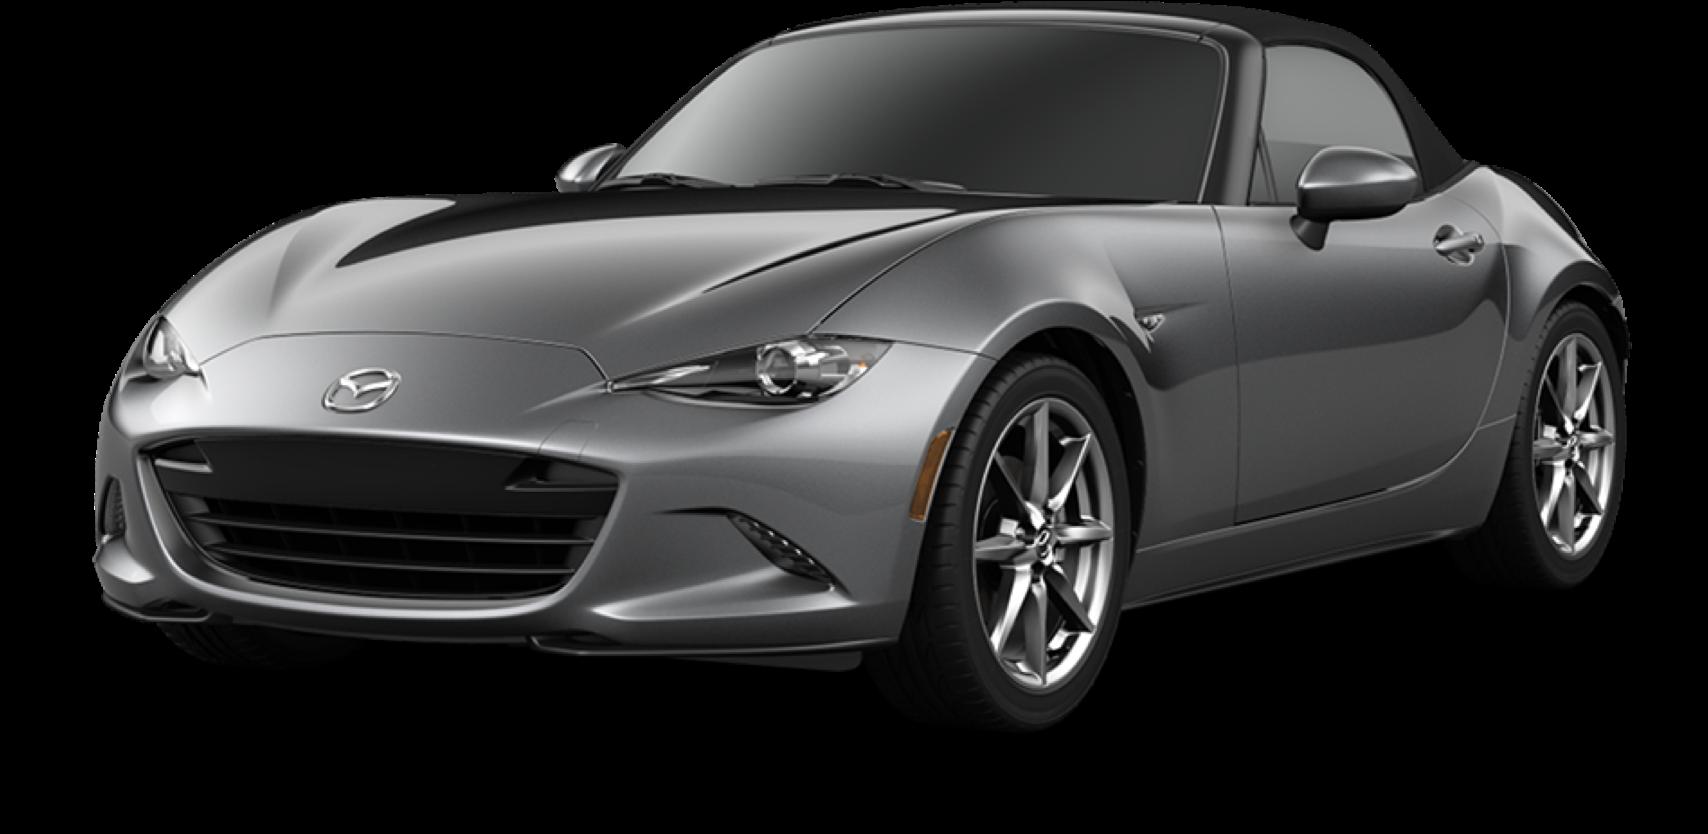 2021 Mazda MX-5 Miata, Machine Gray Metallic